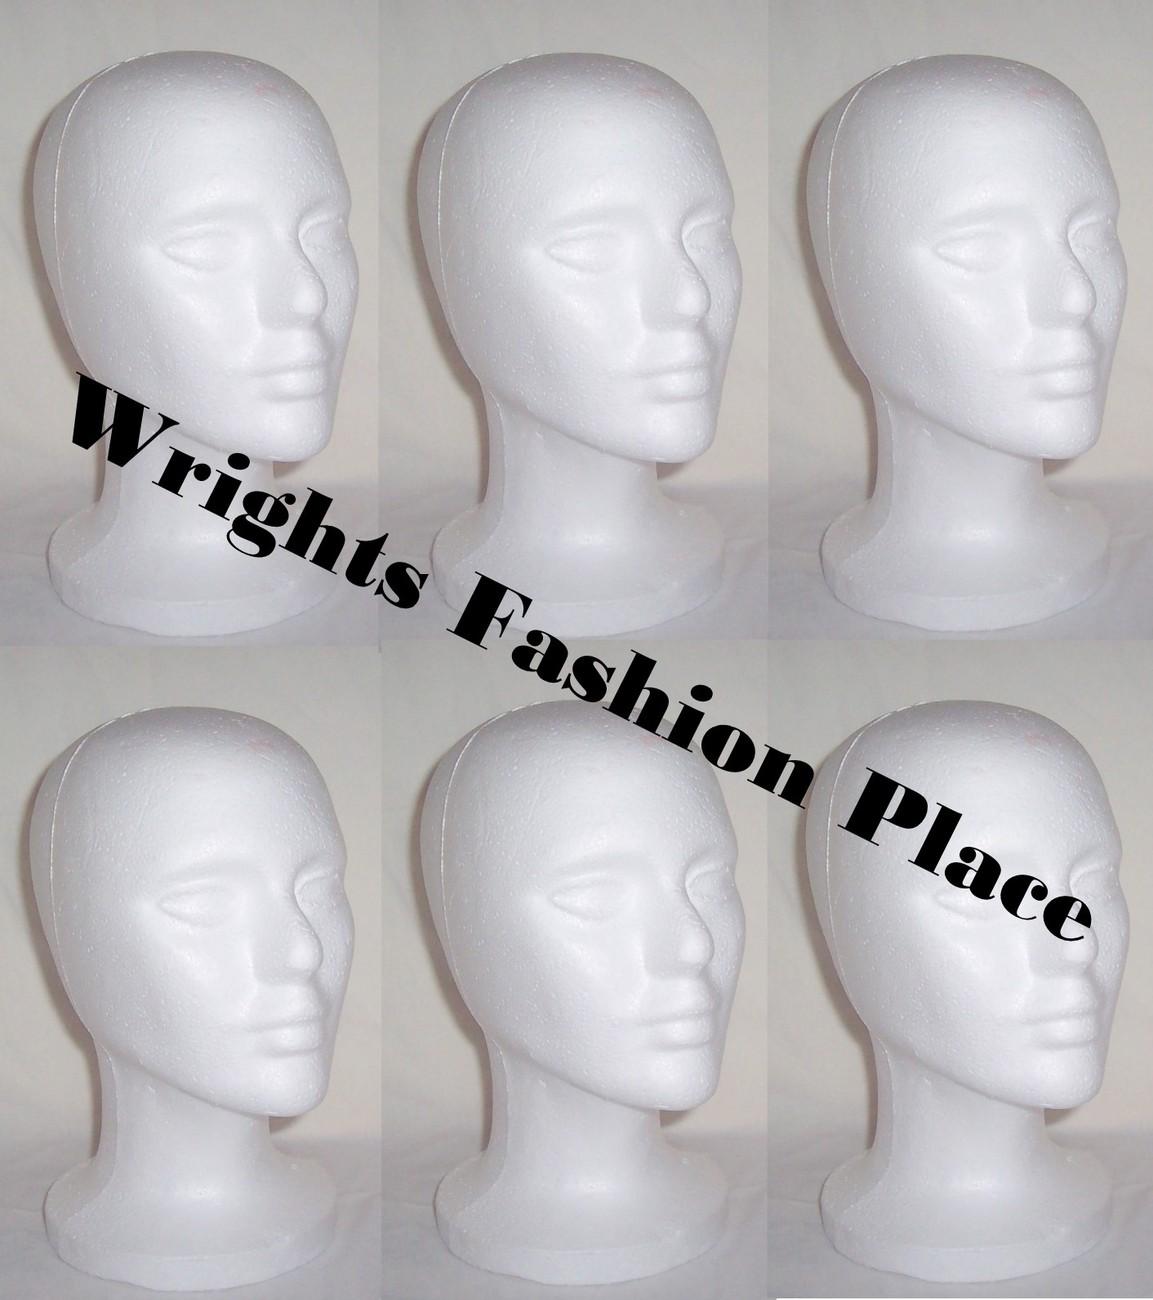 Mannequin-foam-wig-head-6